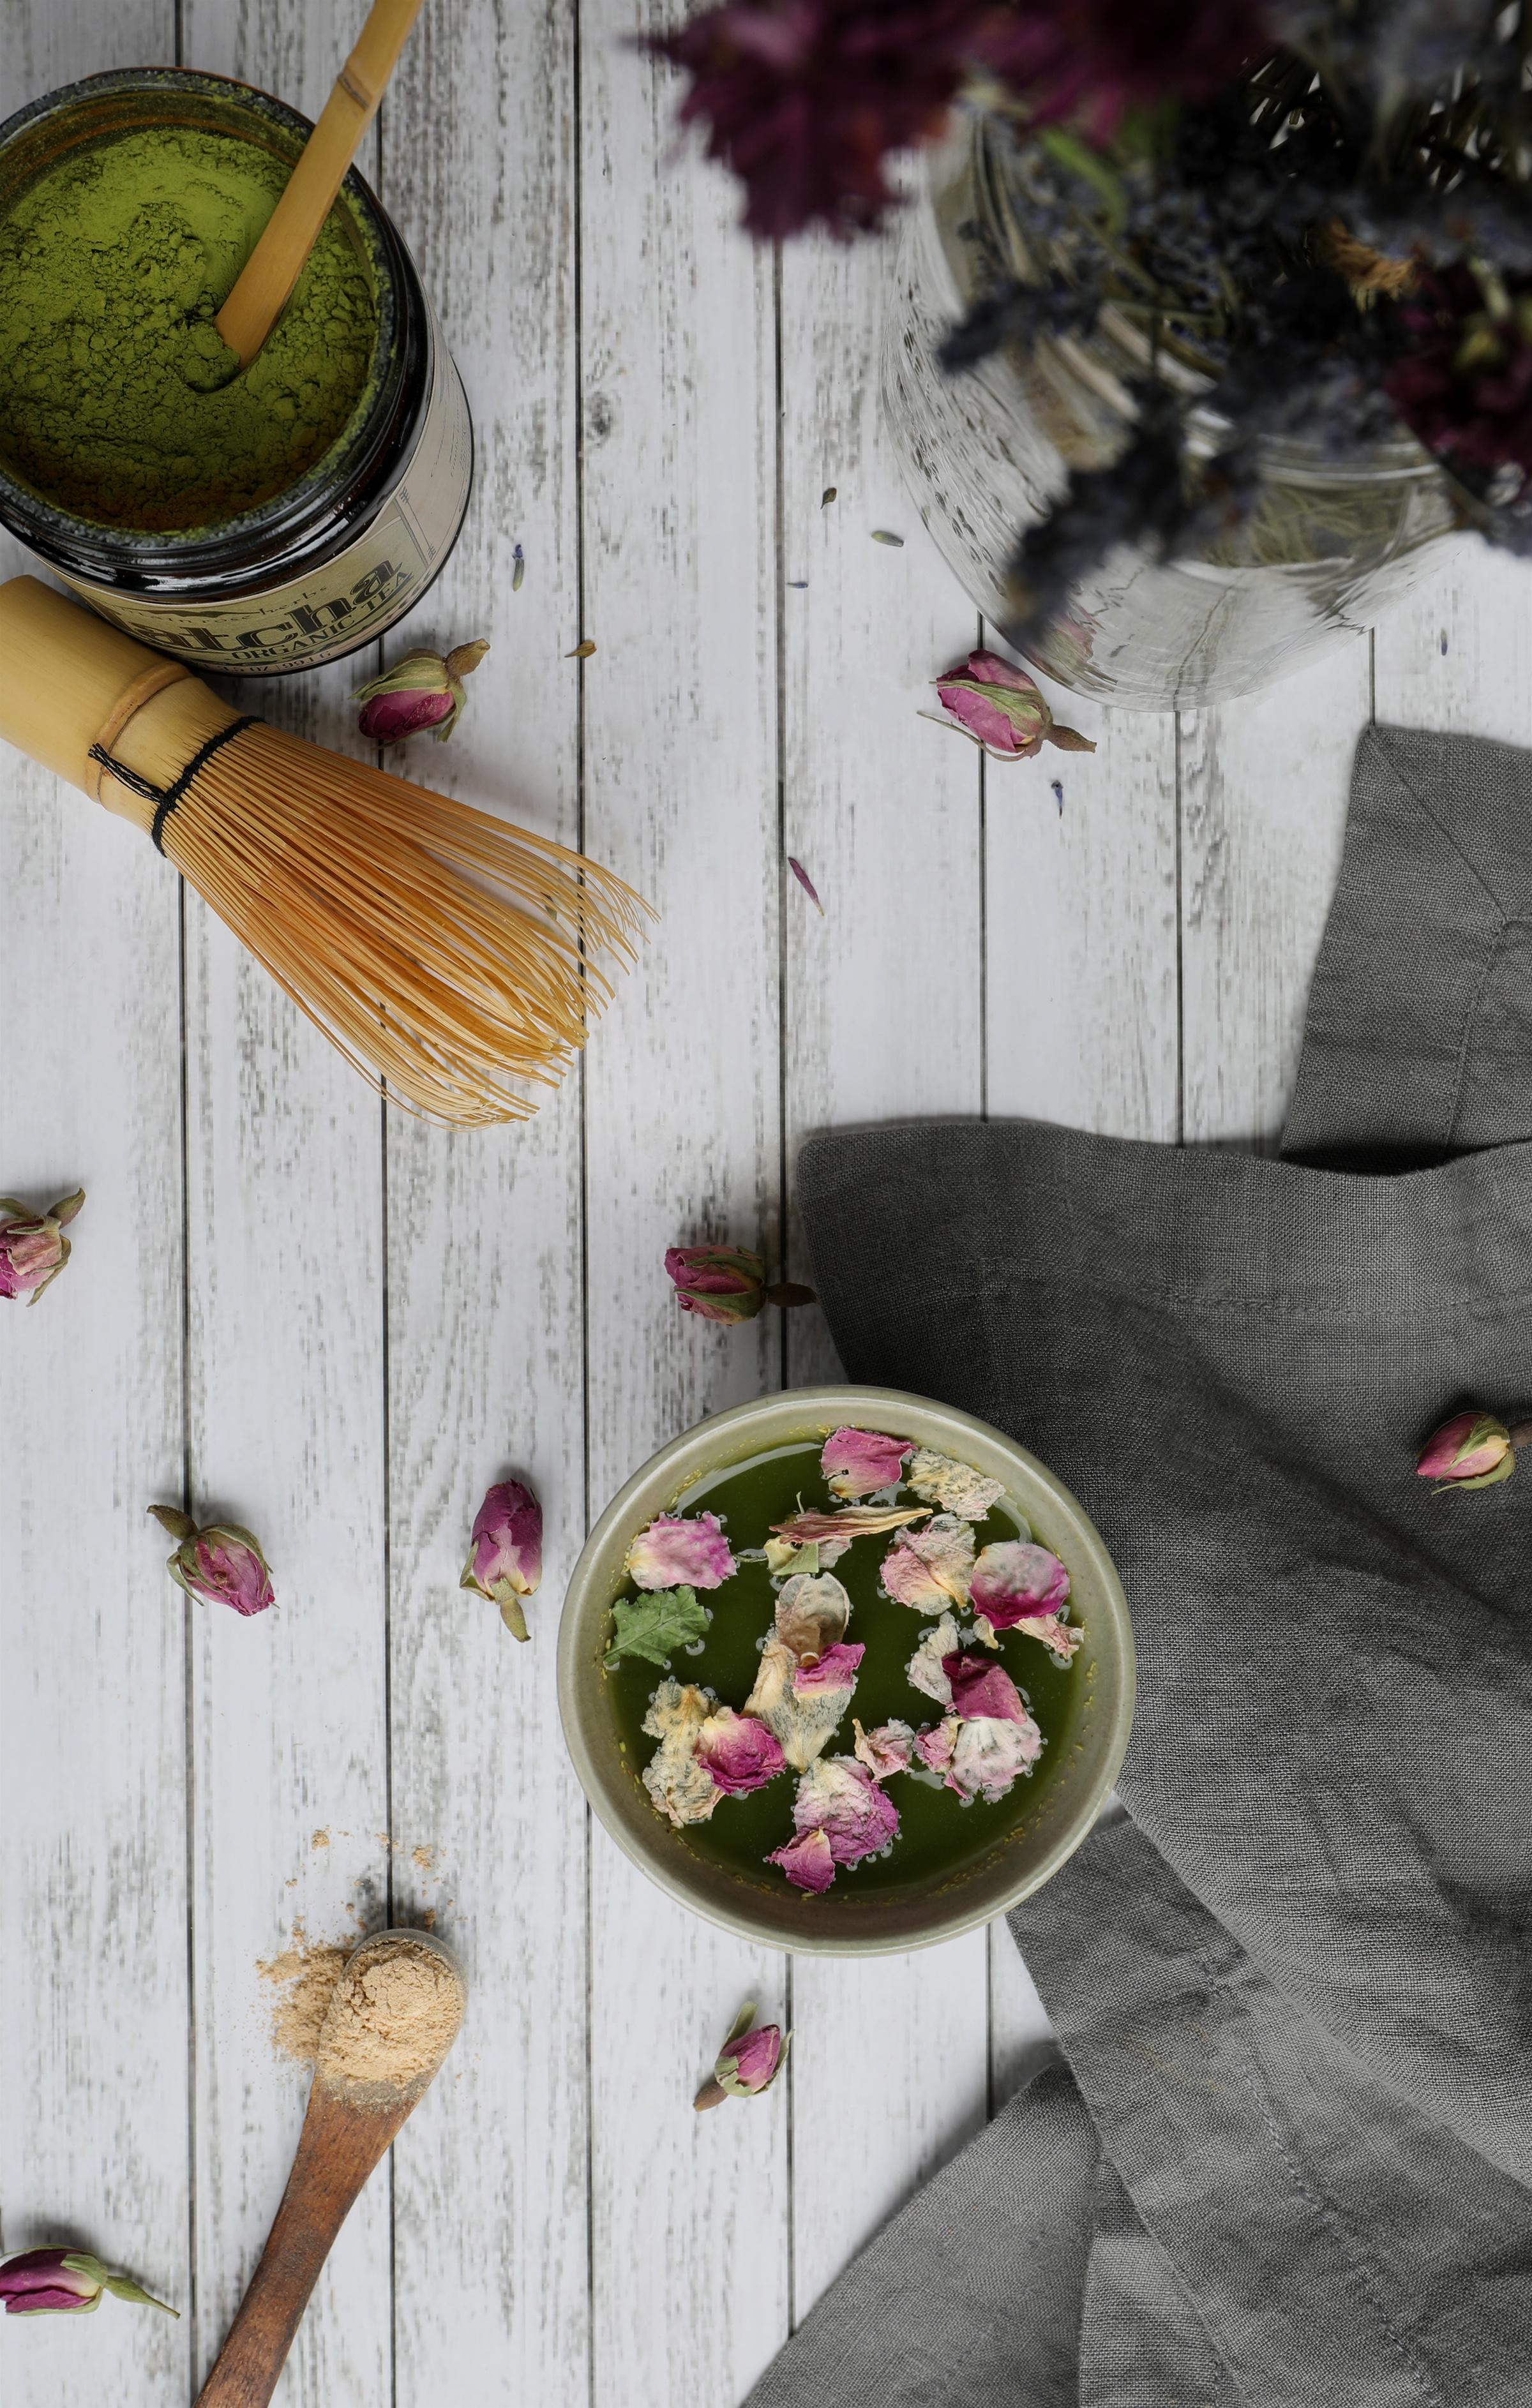 Mug with Matcha Tea and rose petals with tea accessories and cloth